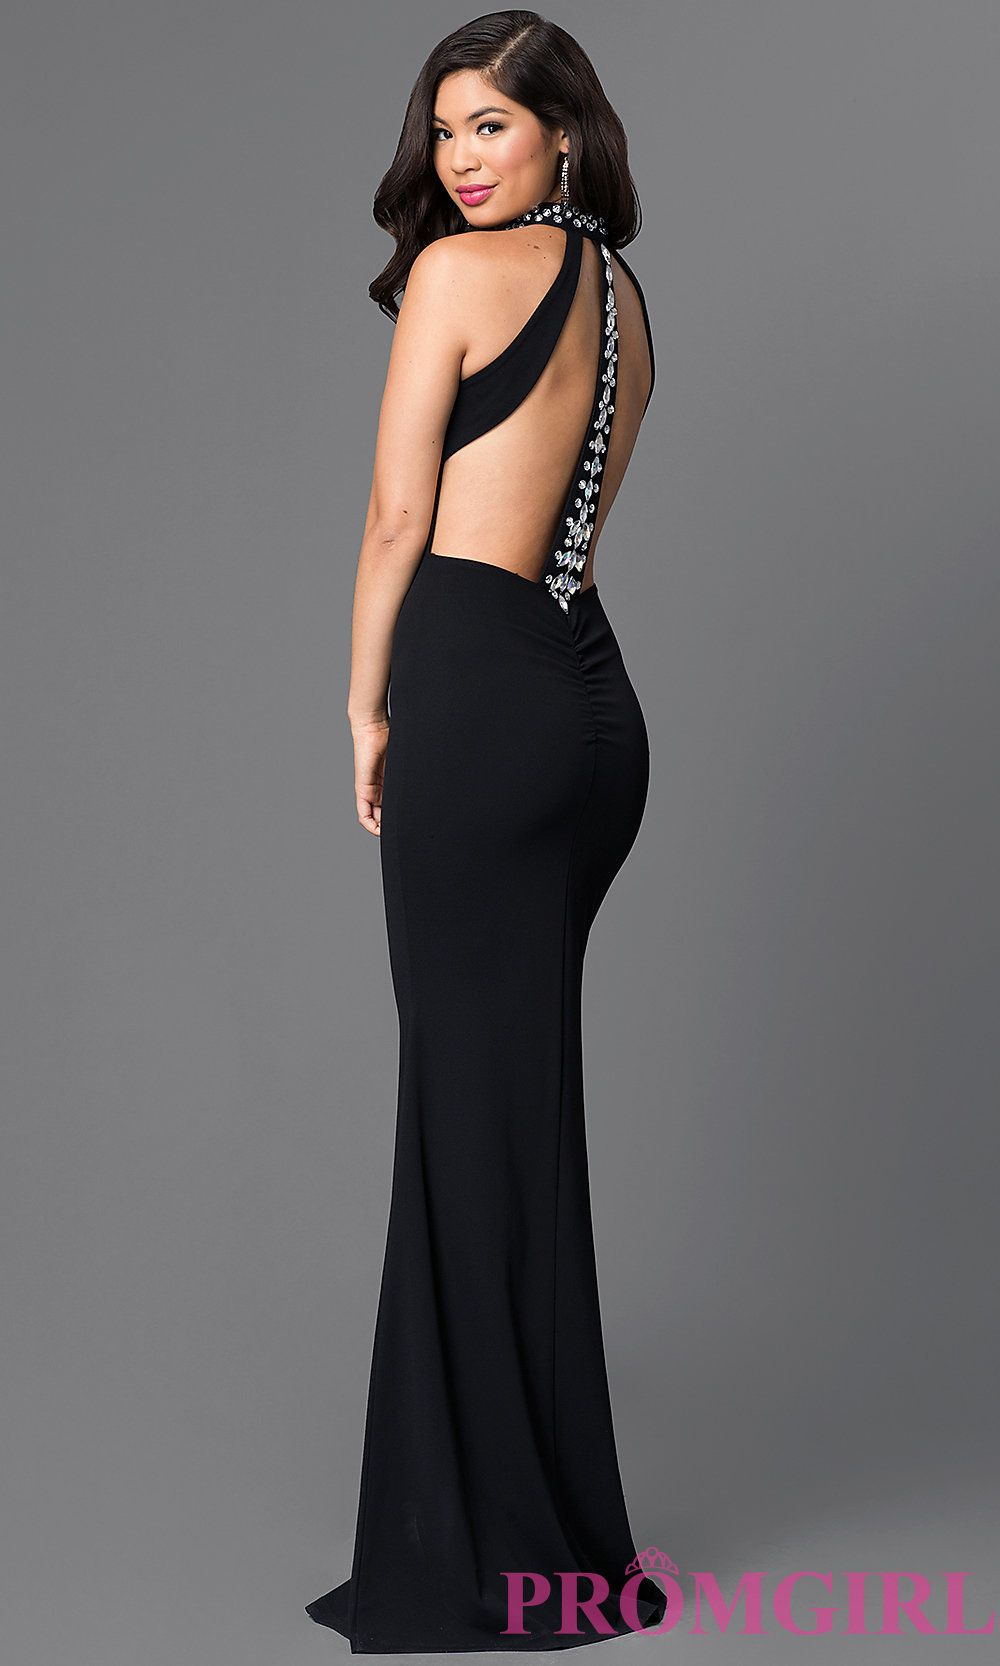 High Neck Long Black Open Back Formal Dress Long Sleeve Mermaid Prom Dress Evening Dress Fashion Long Black Dress Formal [ 1666 x 1000 Pixel ]